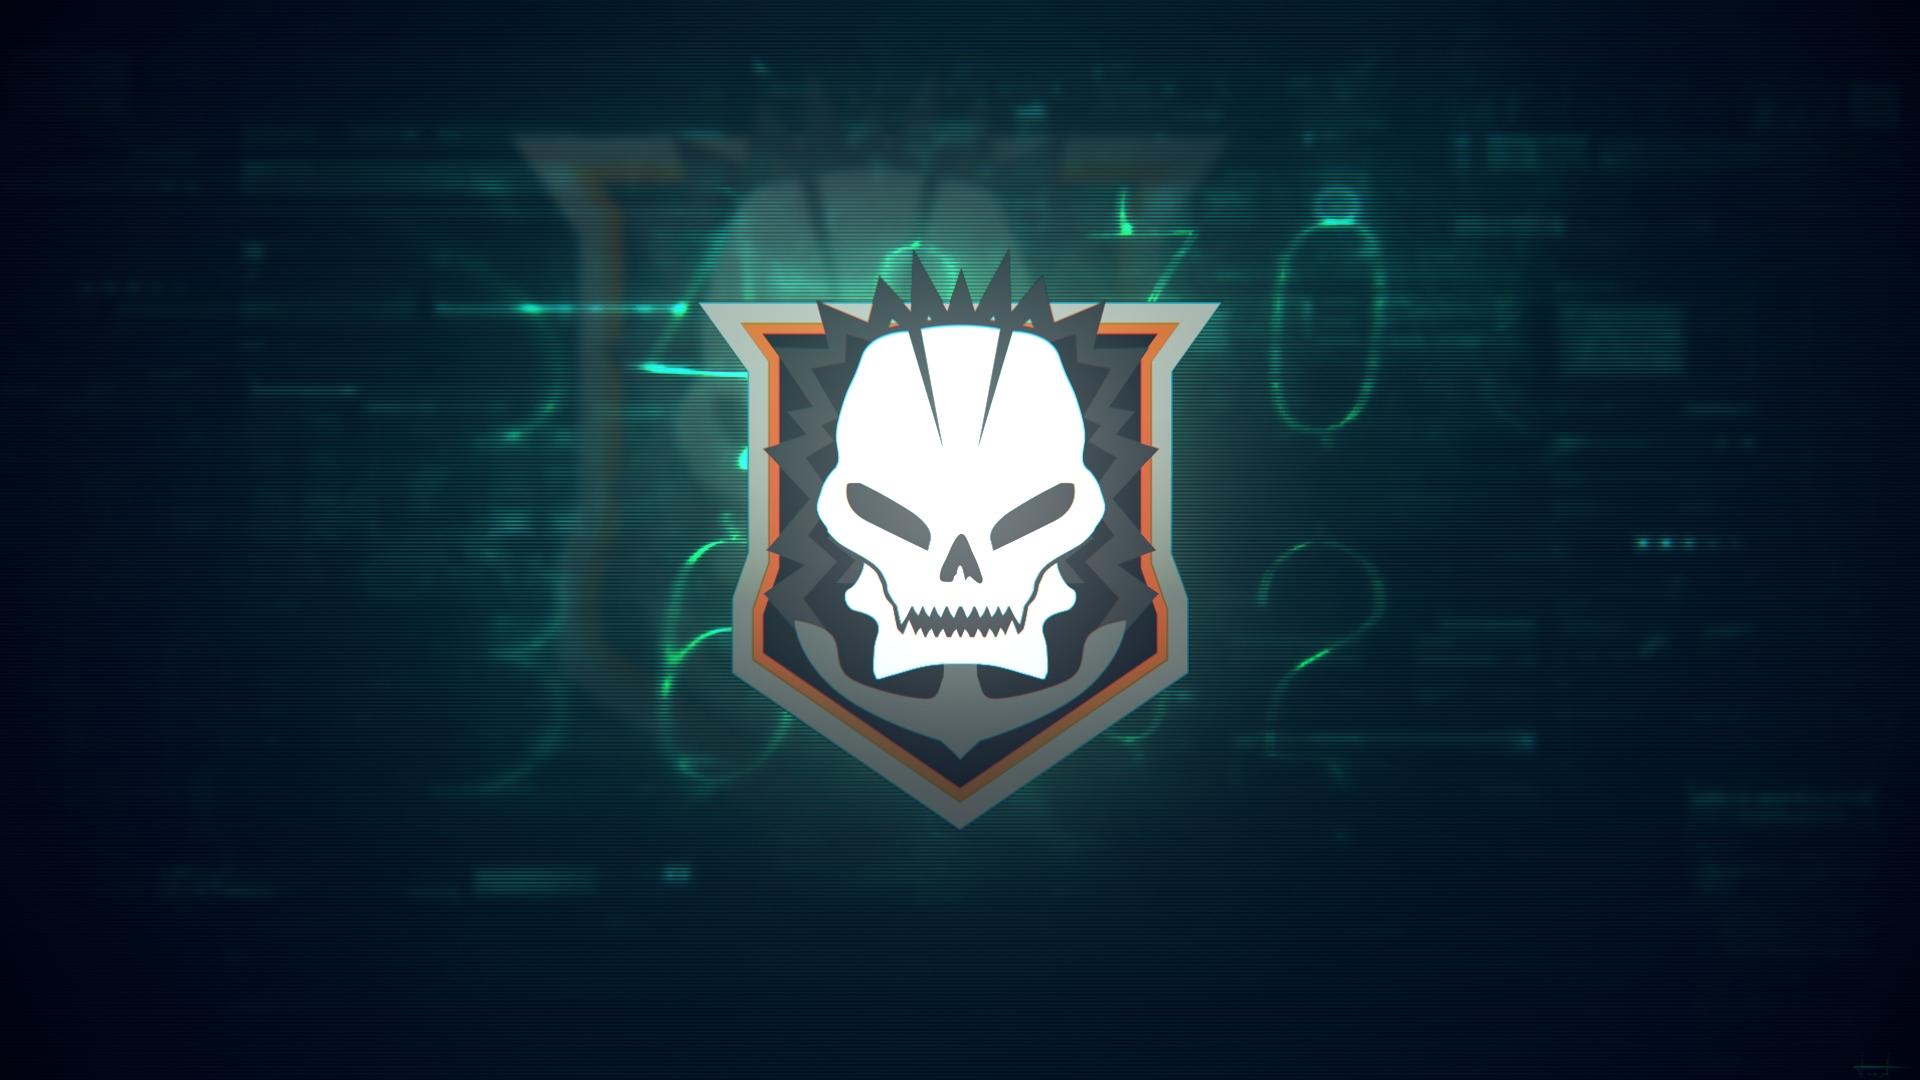 Black Ops 2 Skull Wallpaper Hd 2 By Muusedesign On Deviantart